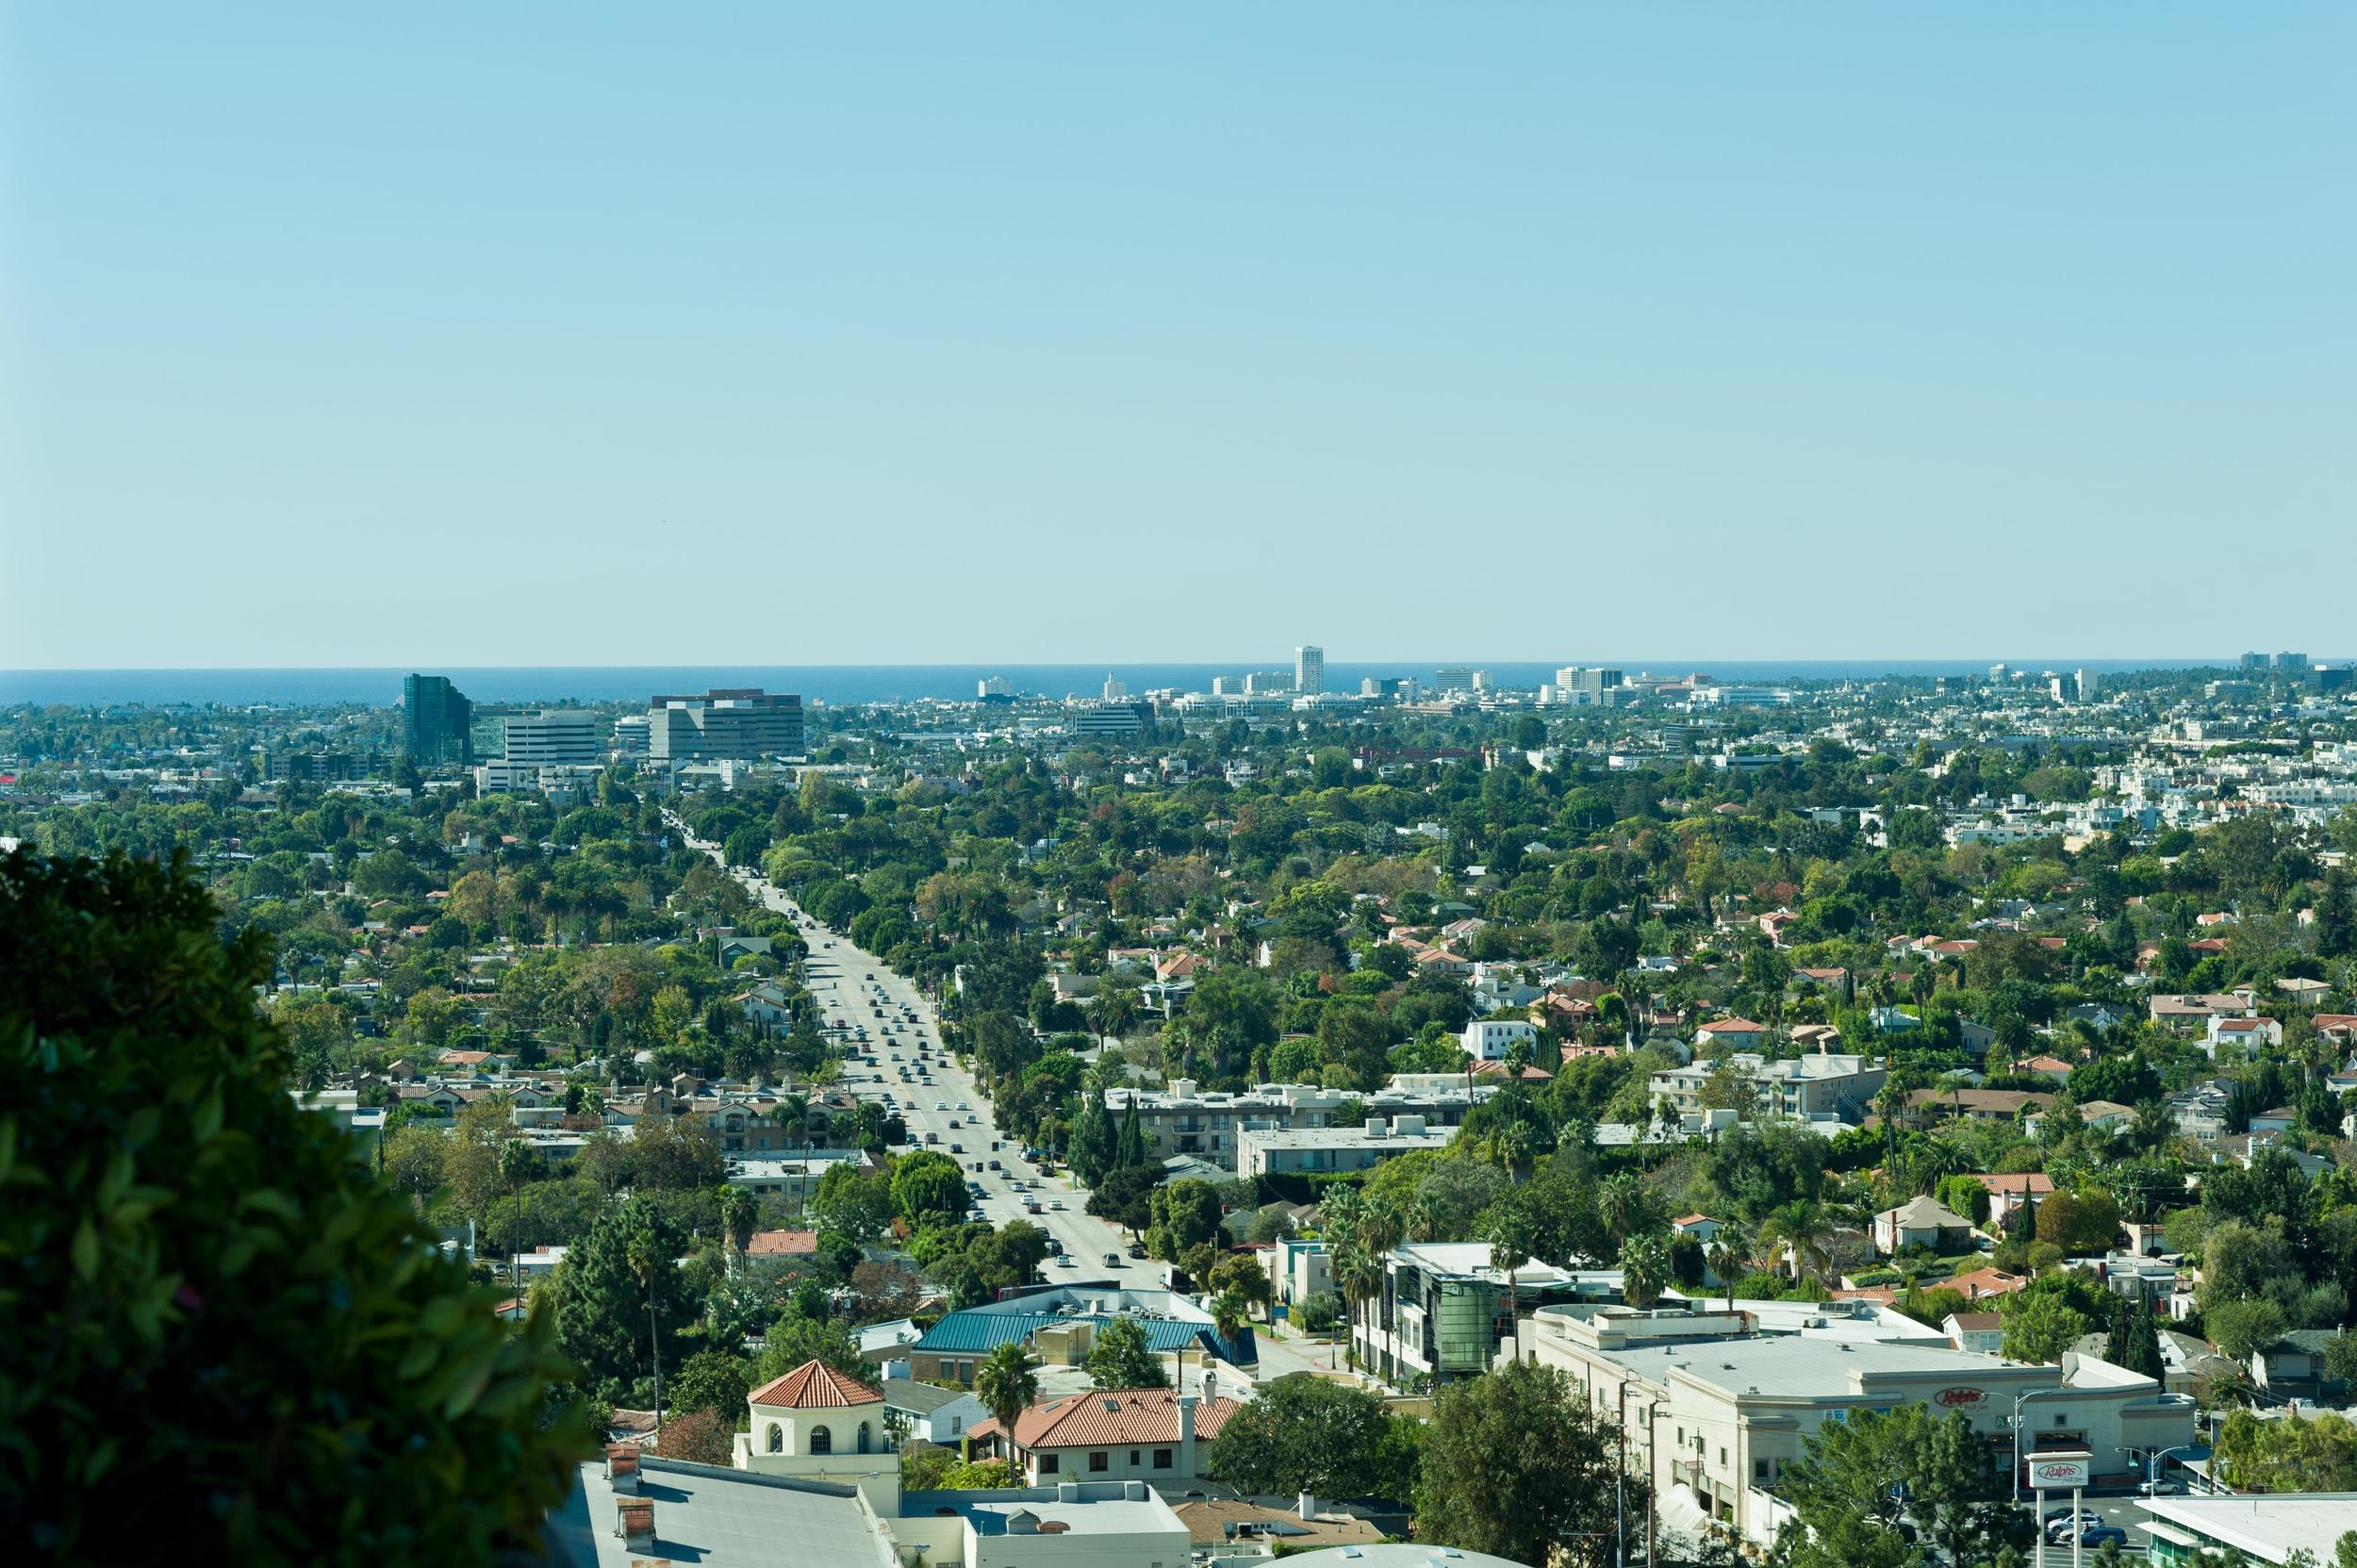 cityscape-los-angeles_23453628266_o.jpg